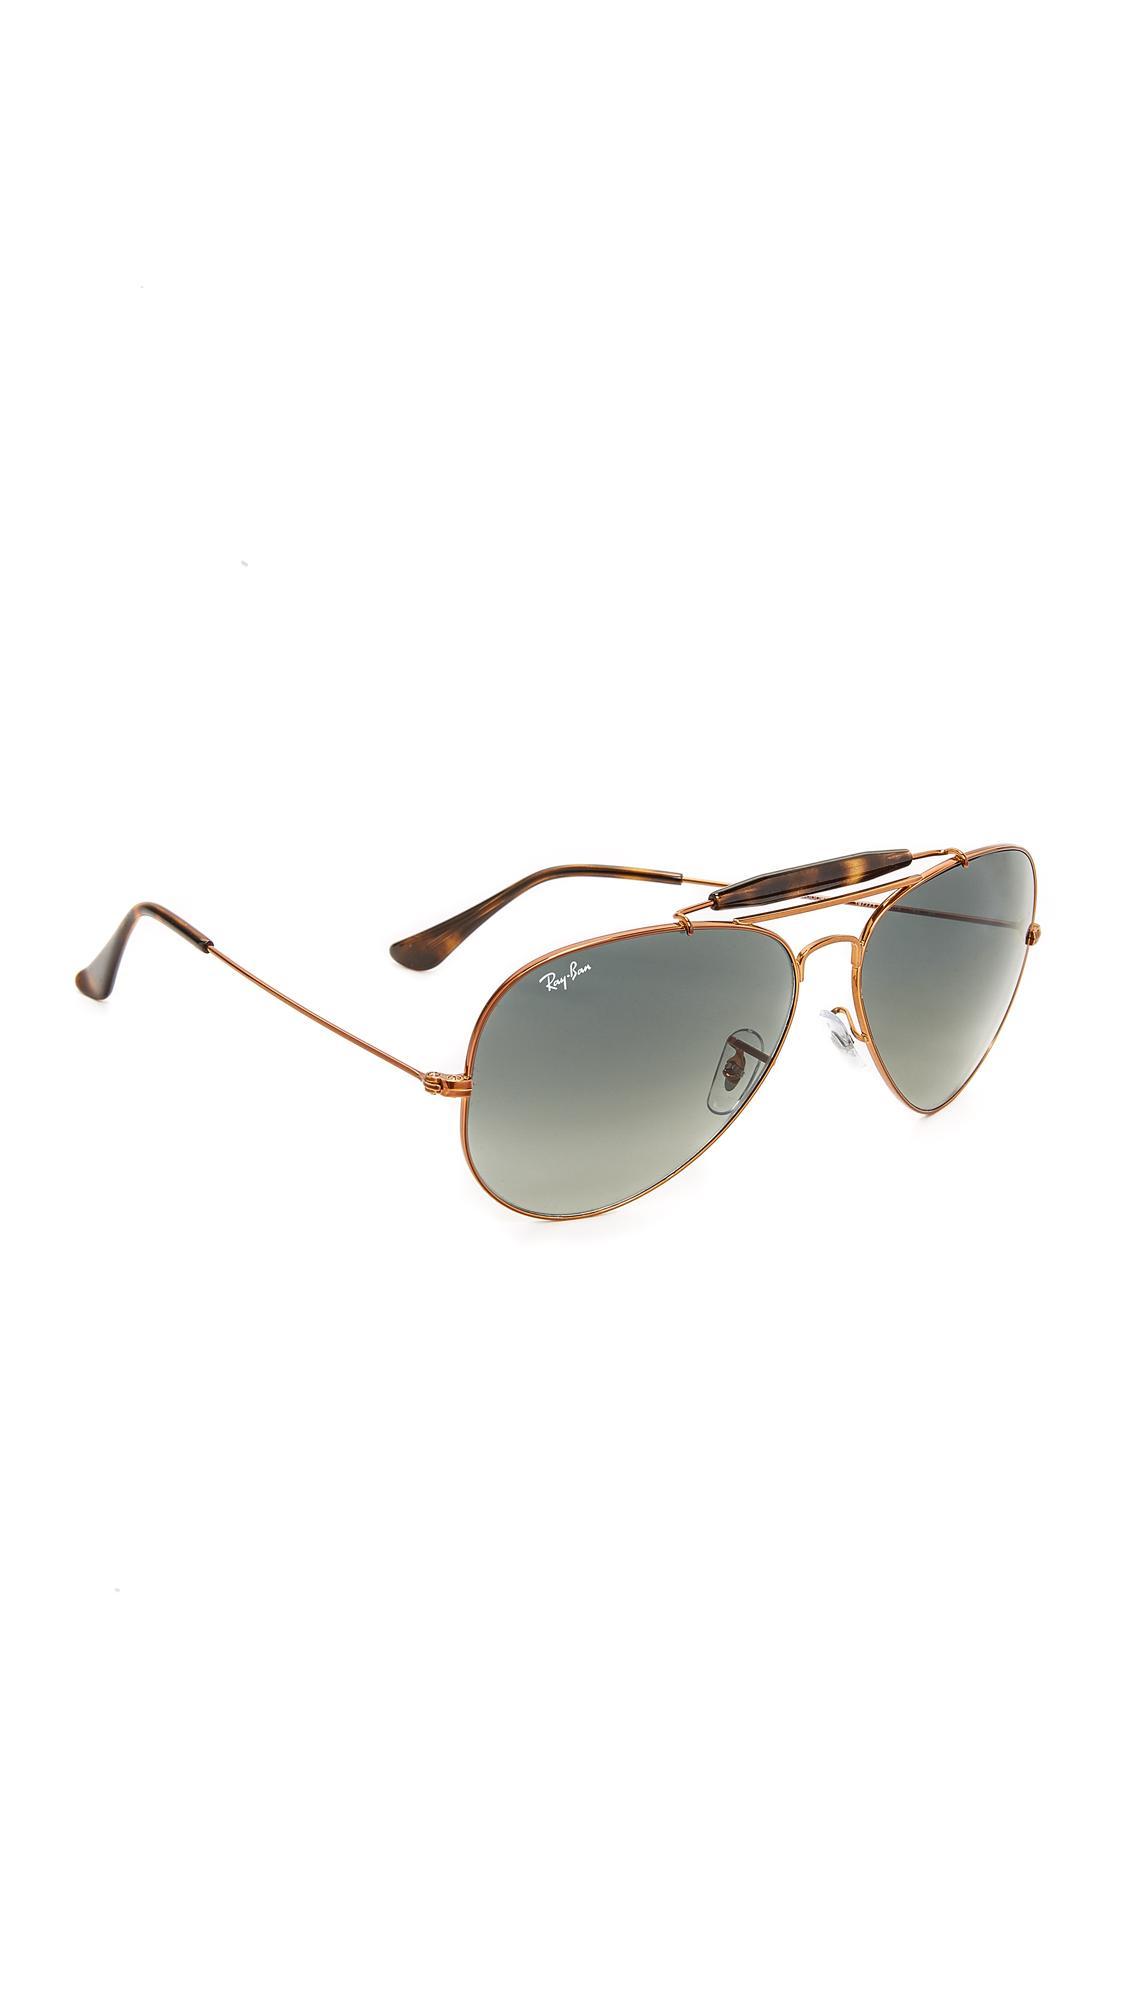 womens ray ban aviator sunglasses ygda  womens ray ban aviator polarized brown lens sunglasses italy